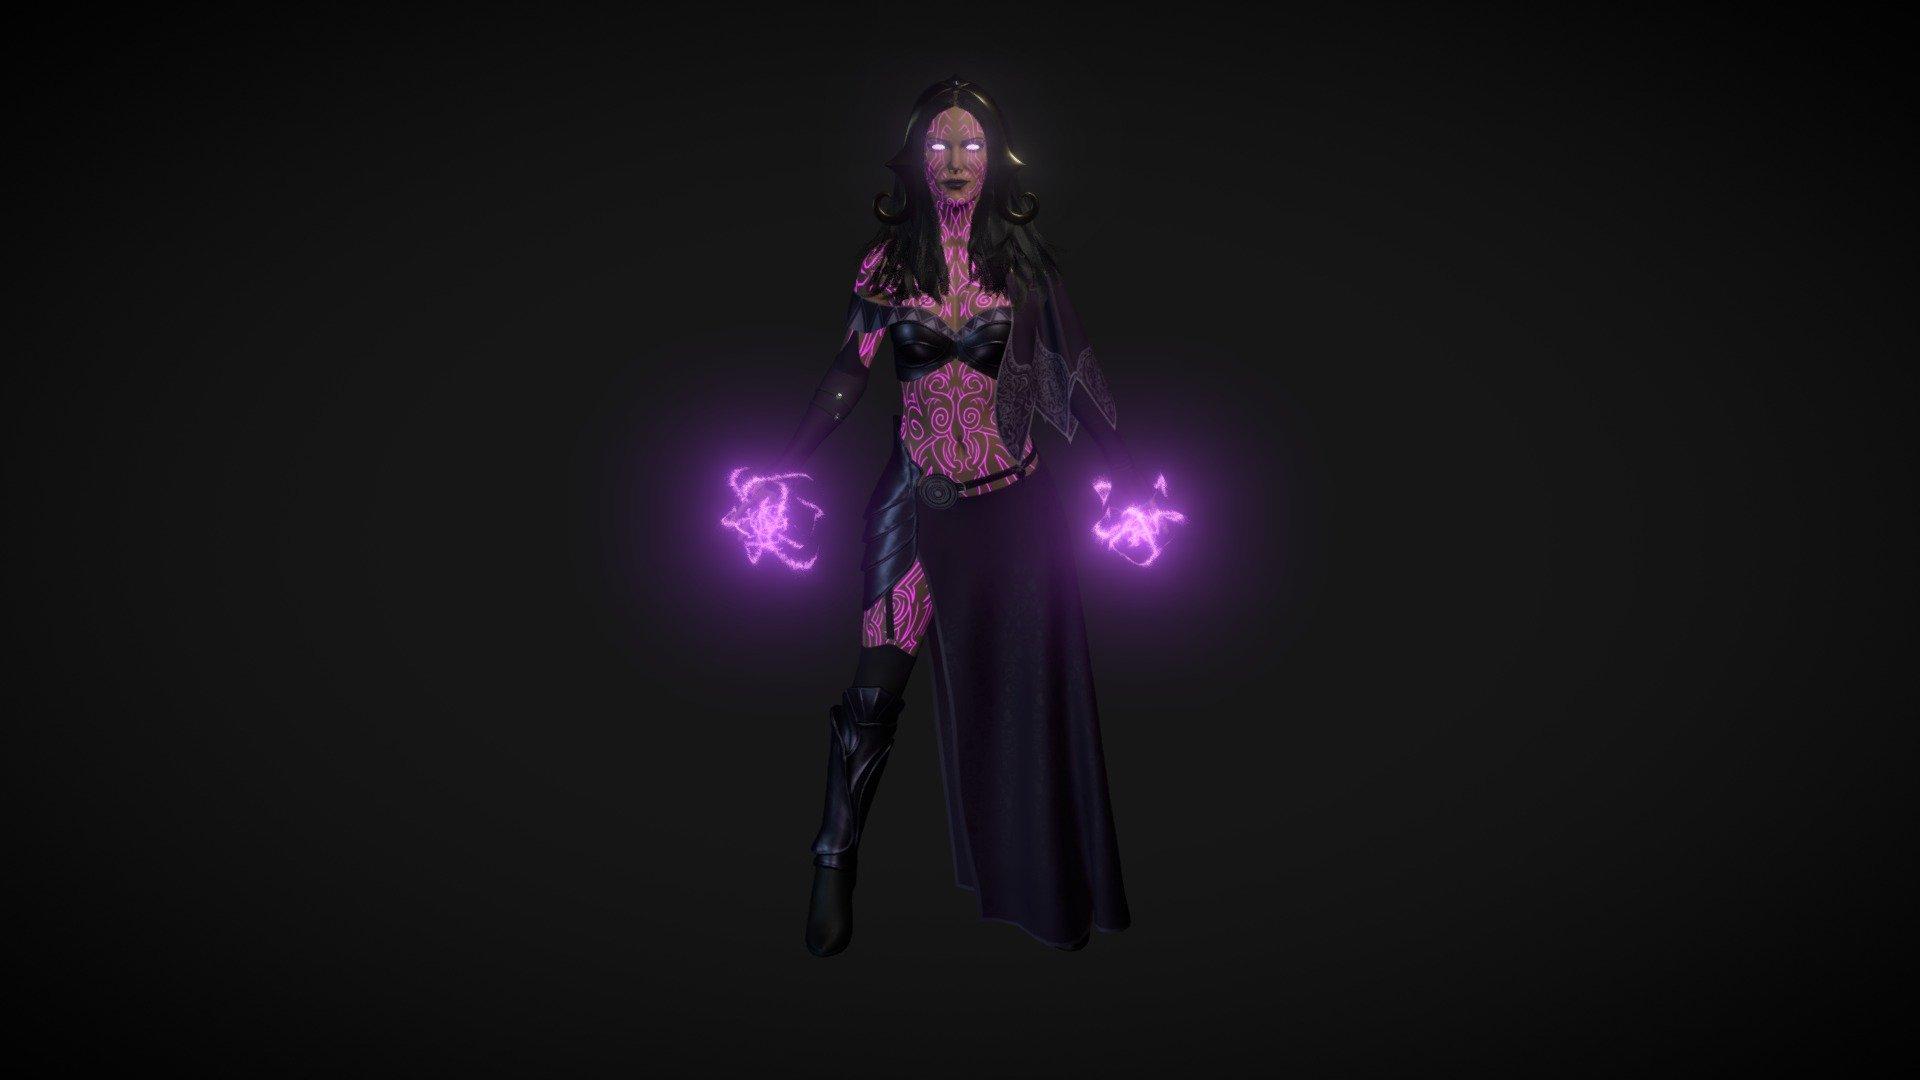 liliana art model